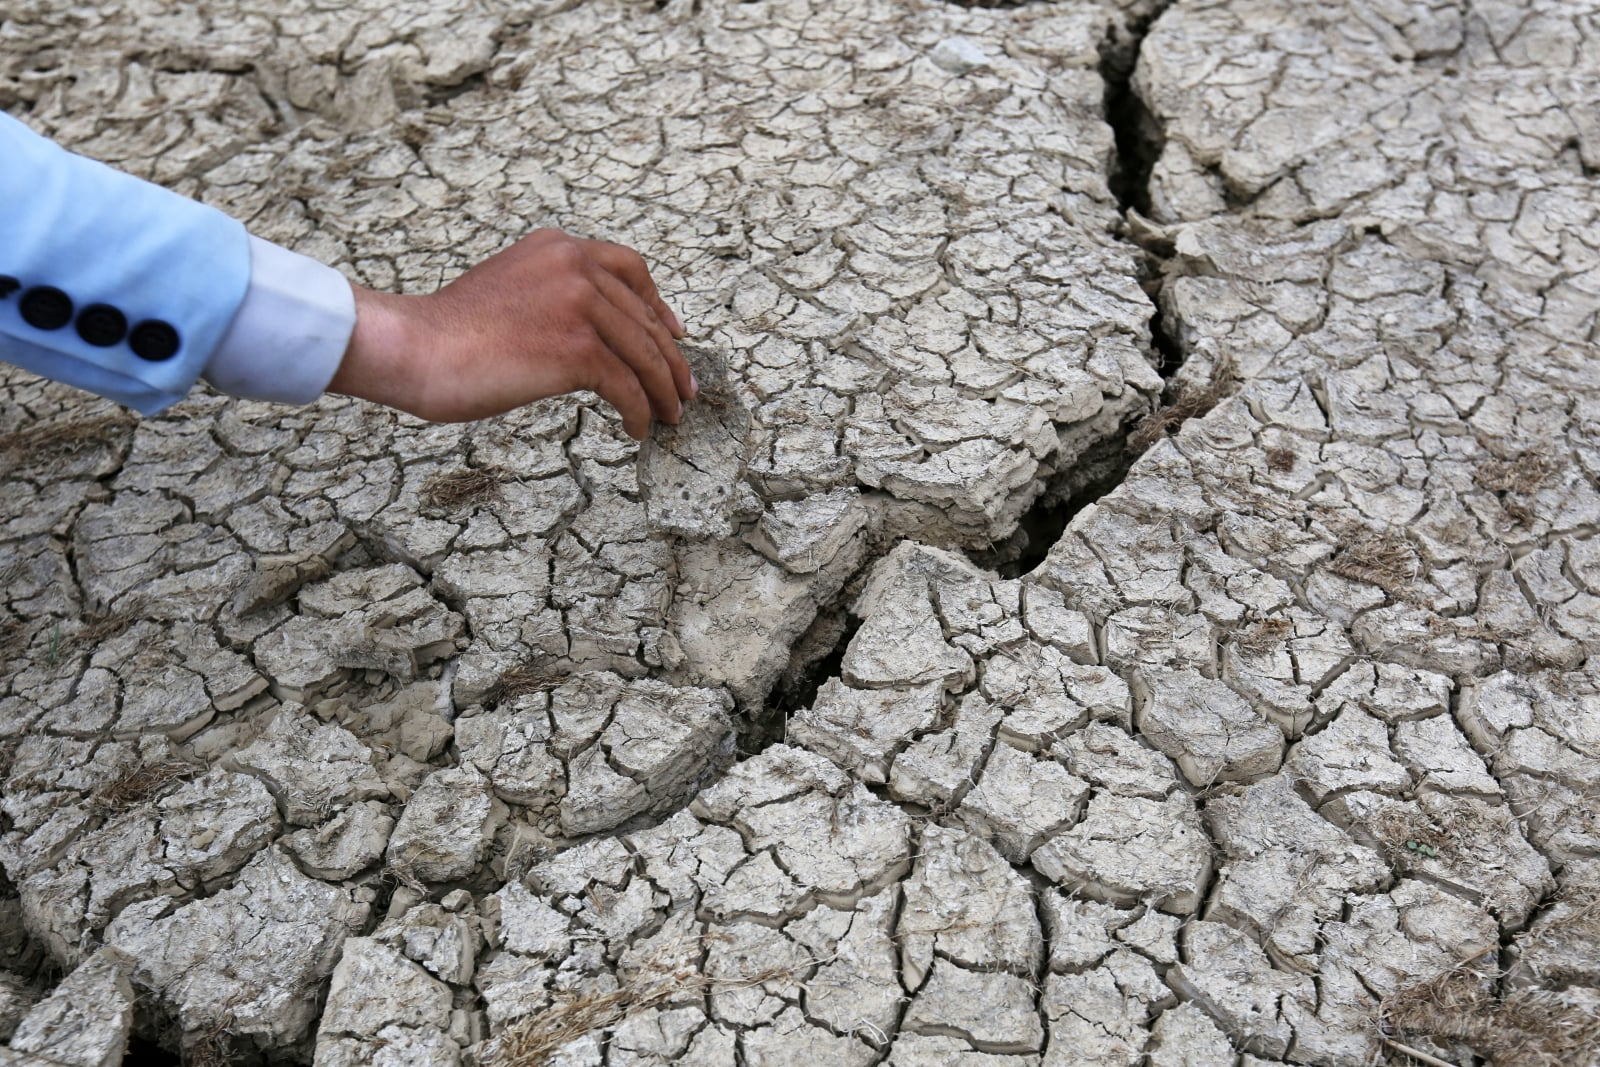 Sucha w Jemenie fot. EPA/YAHYA ARHAB